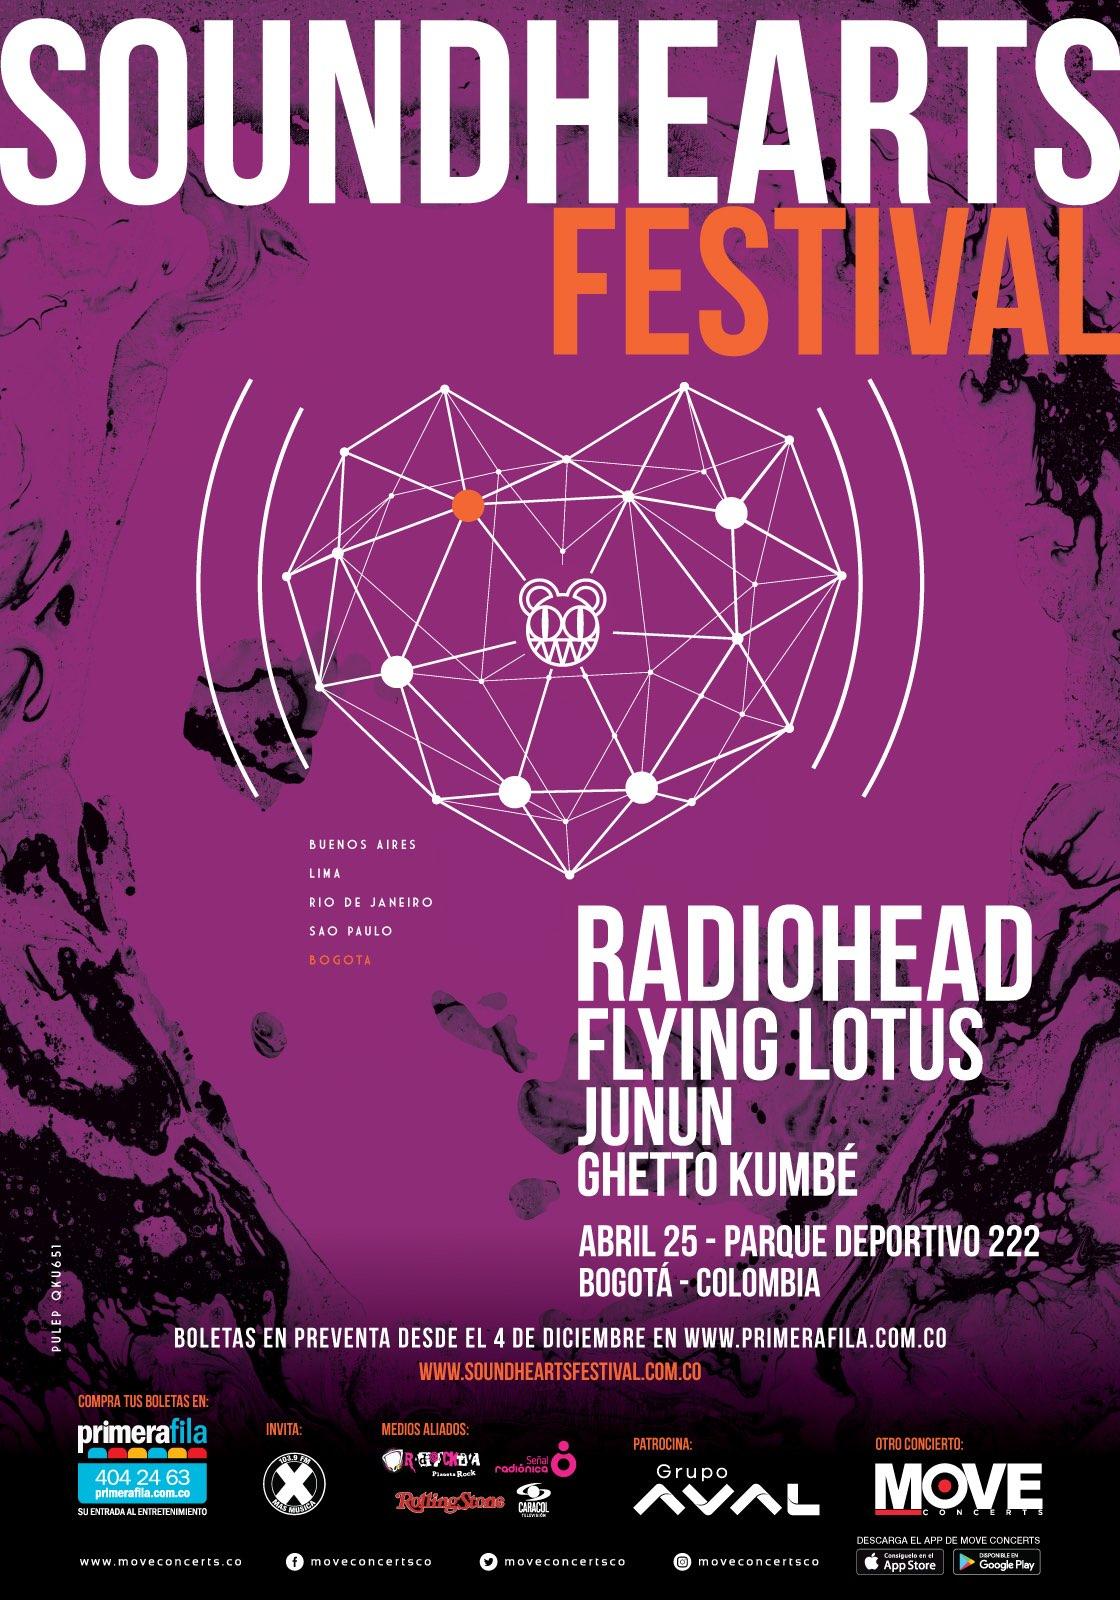 boletas radiohead colombia